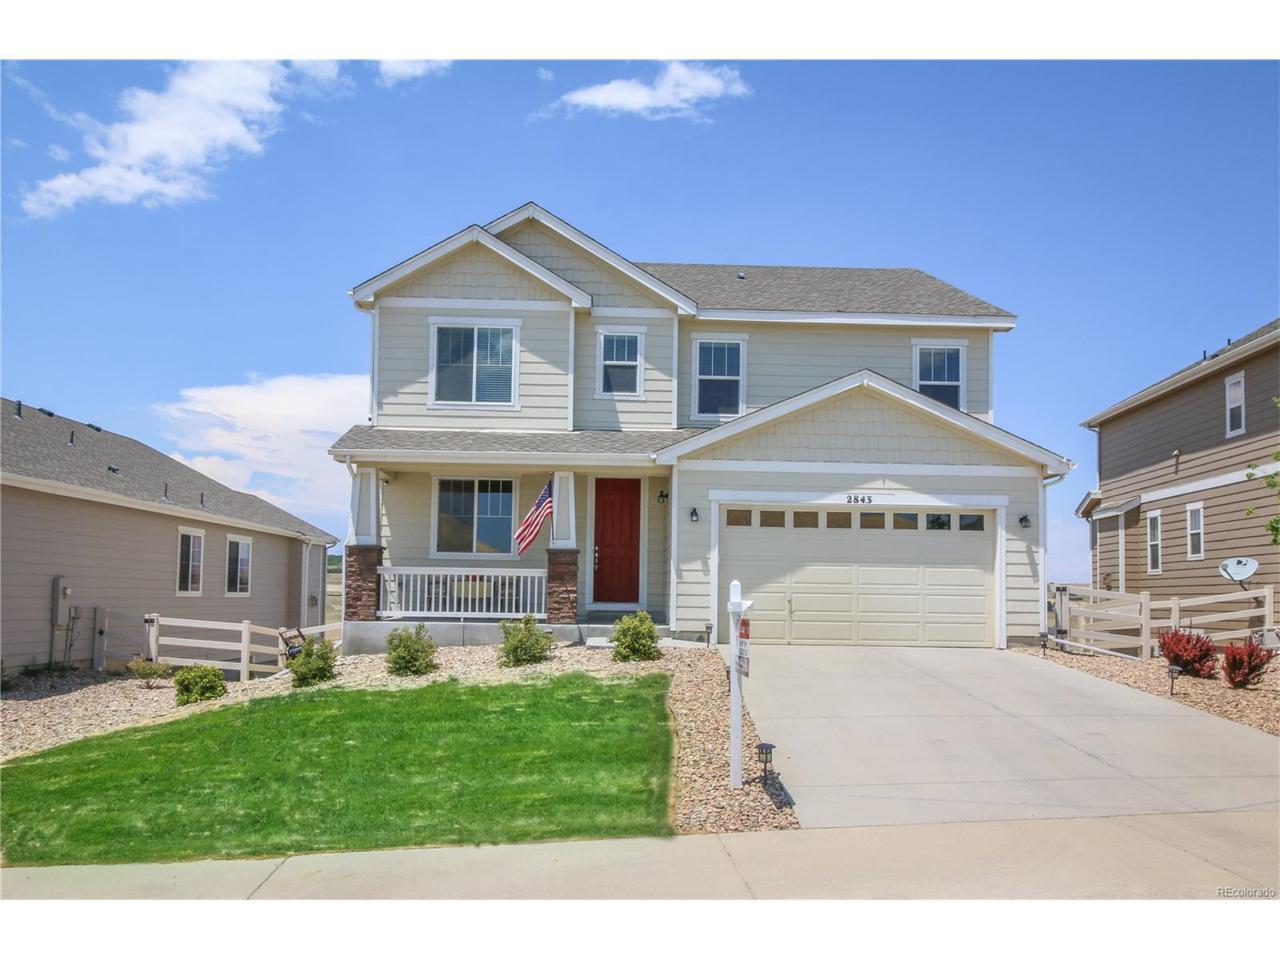 2843 Hillcroft Lane, Castle Rock, CO 80104 (MLS #4058583) :: 8z Real Estate